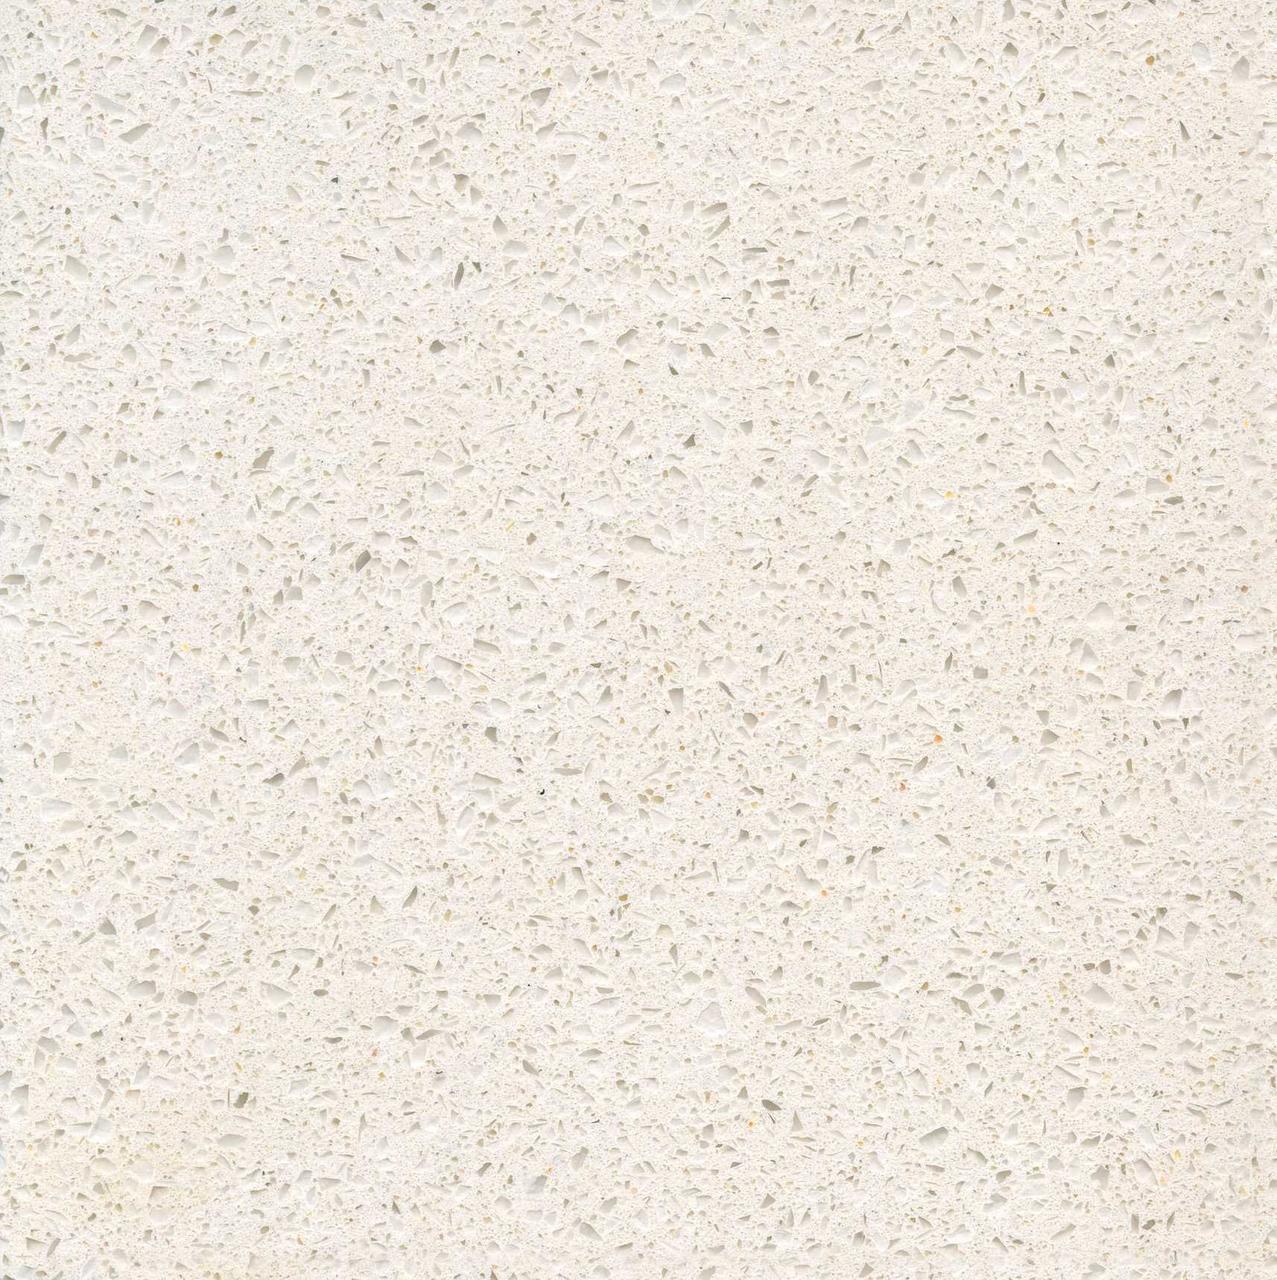 Искусственный камень, Кварц Silestone Blanco Maple 20 мм